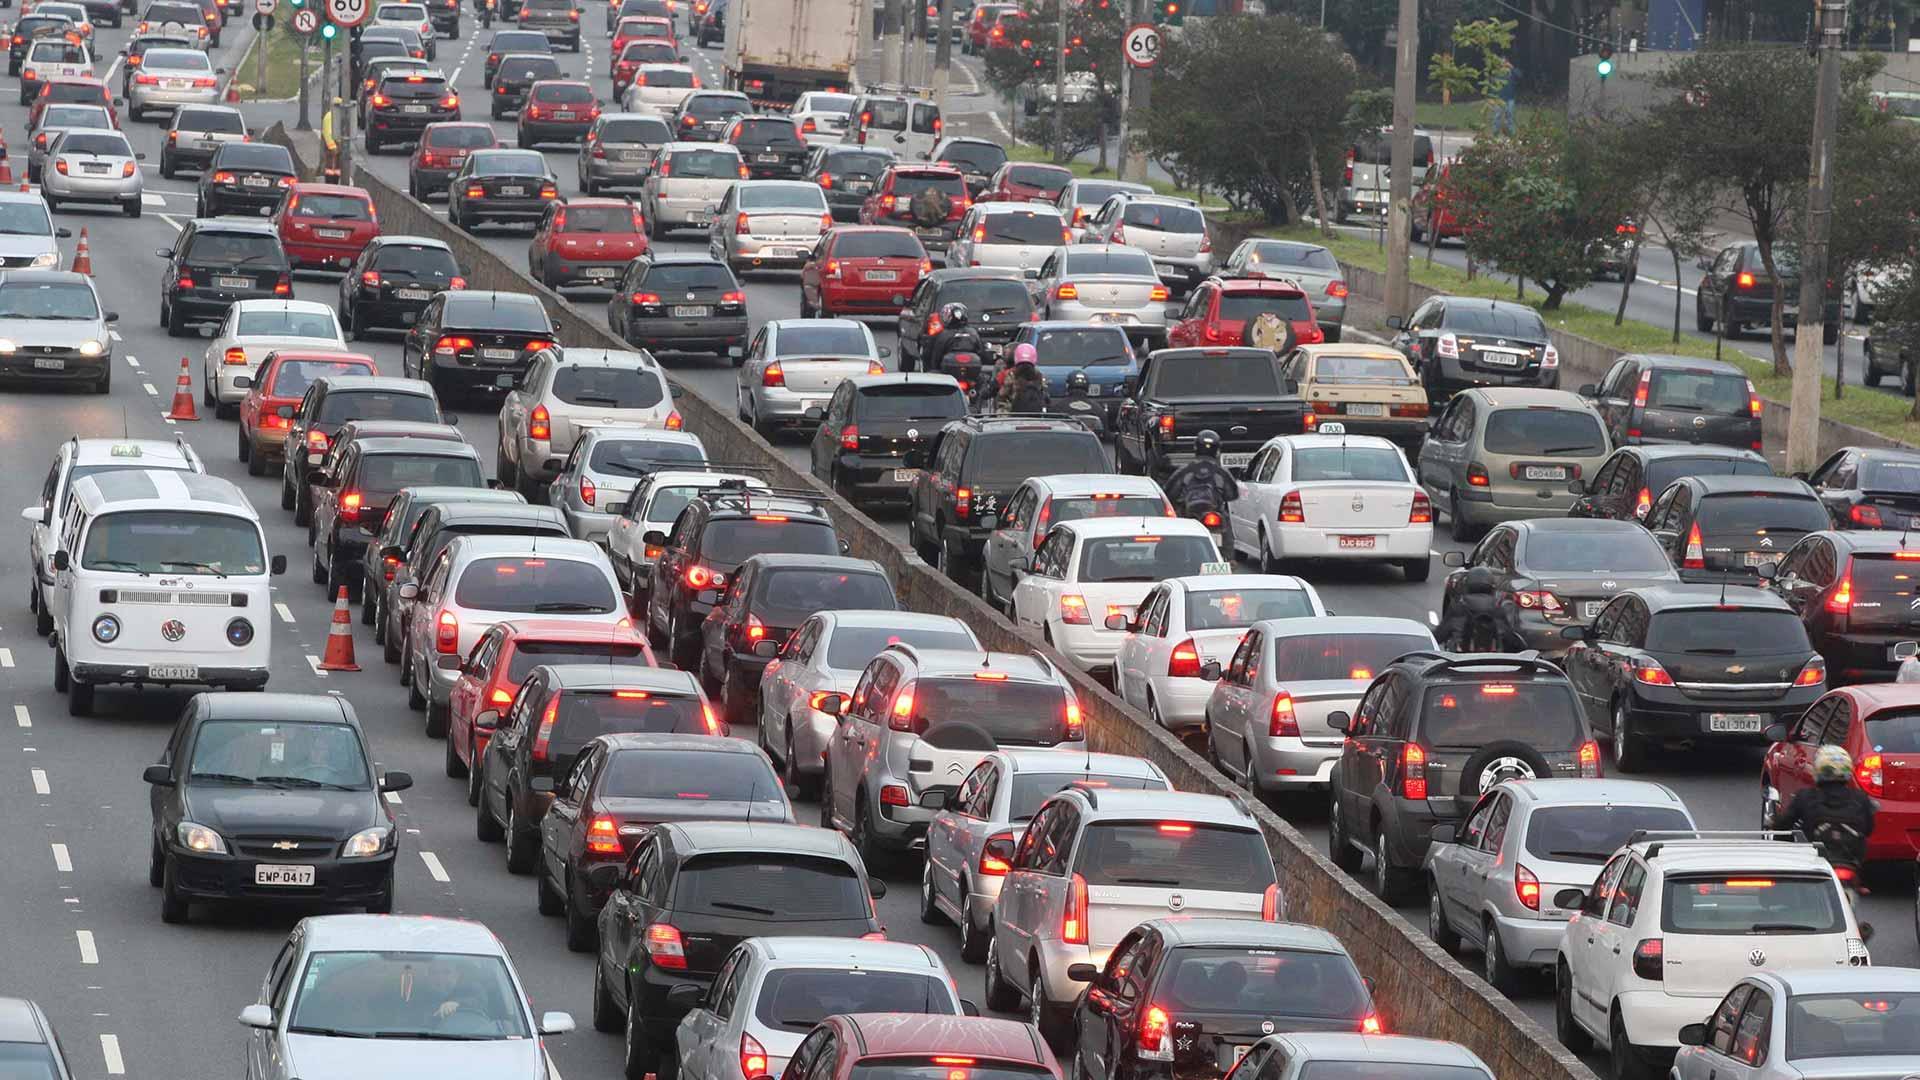 Image result for Traffic Jam images